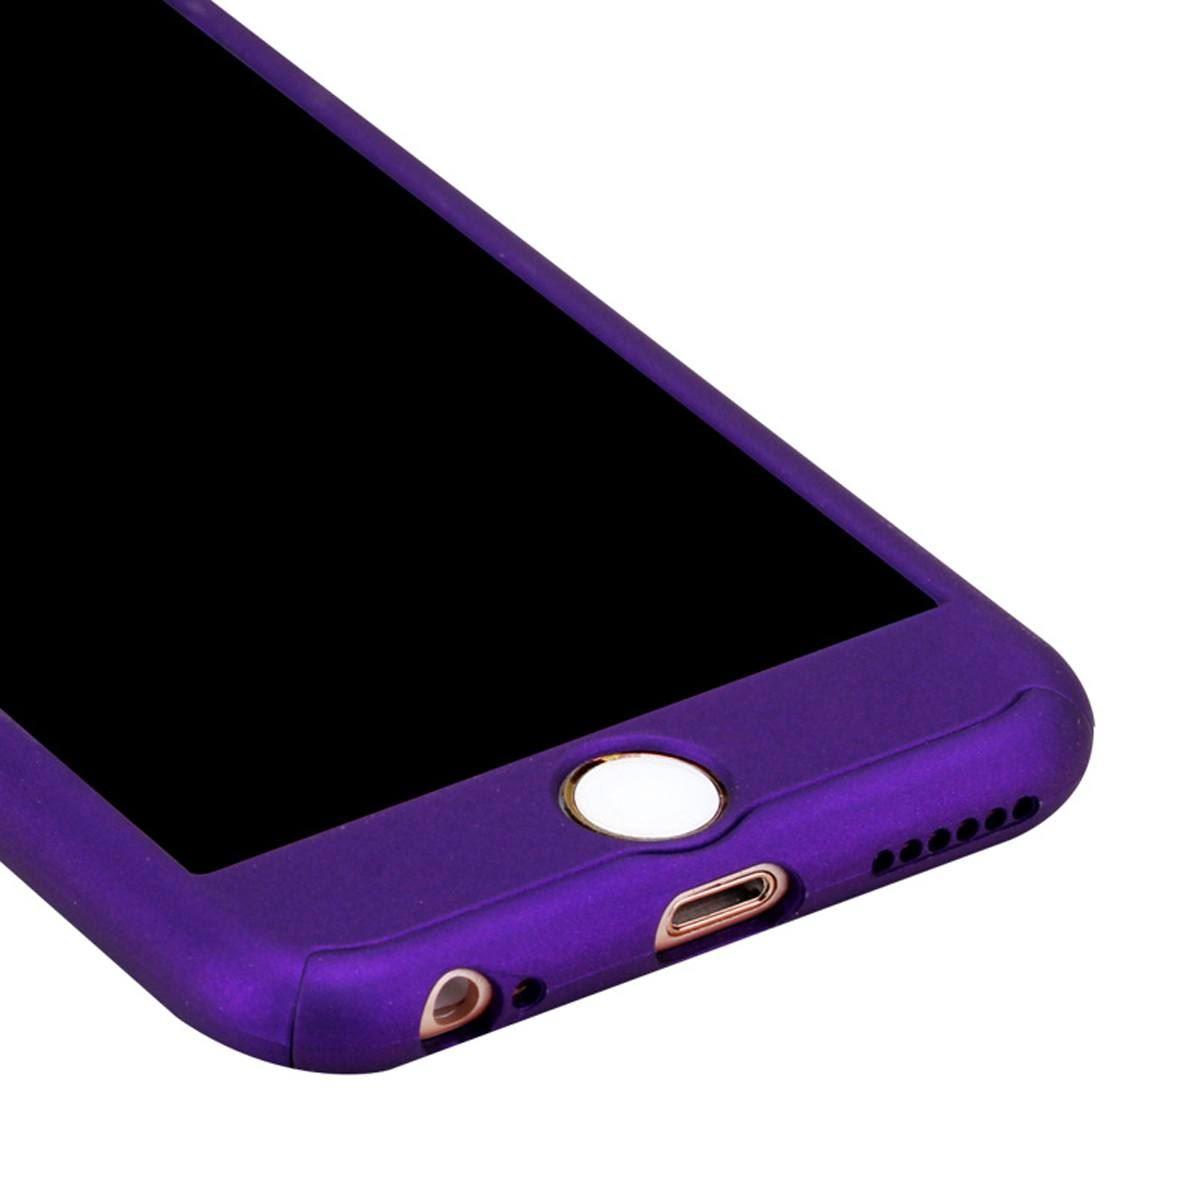 For-Apple-iPhone-XS-Max-XR-Hybrid-360-Slim-Ultra-Thin-Heavy-Duty-Shockproof-Case Indexbild 85